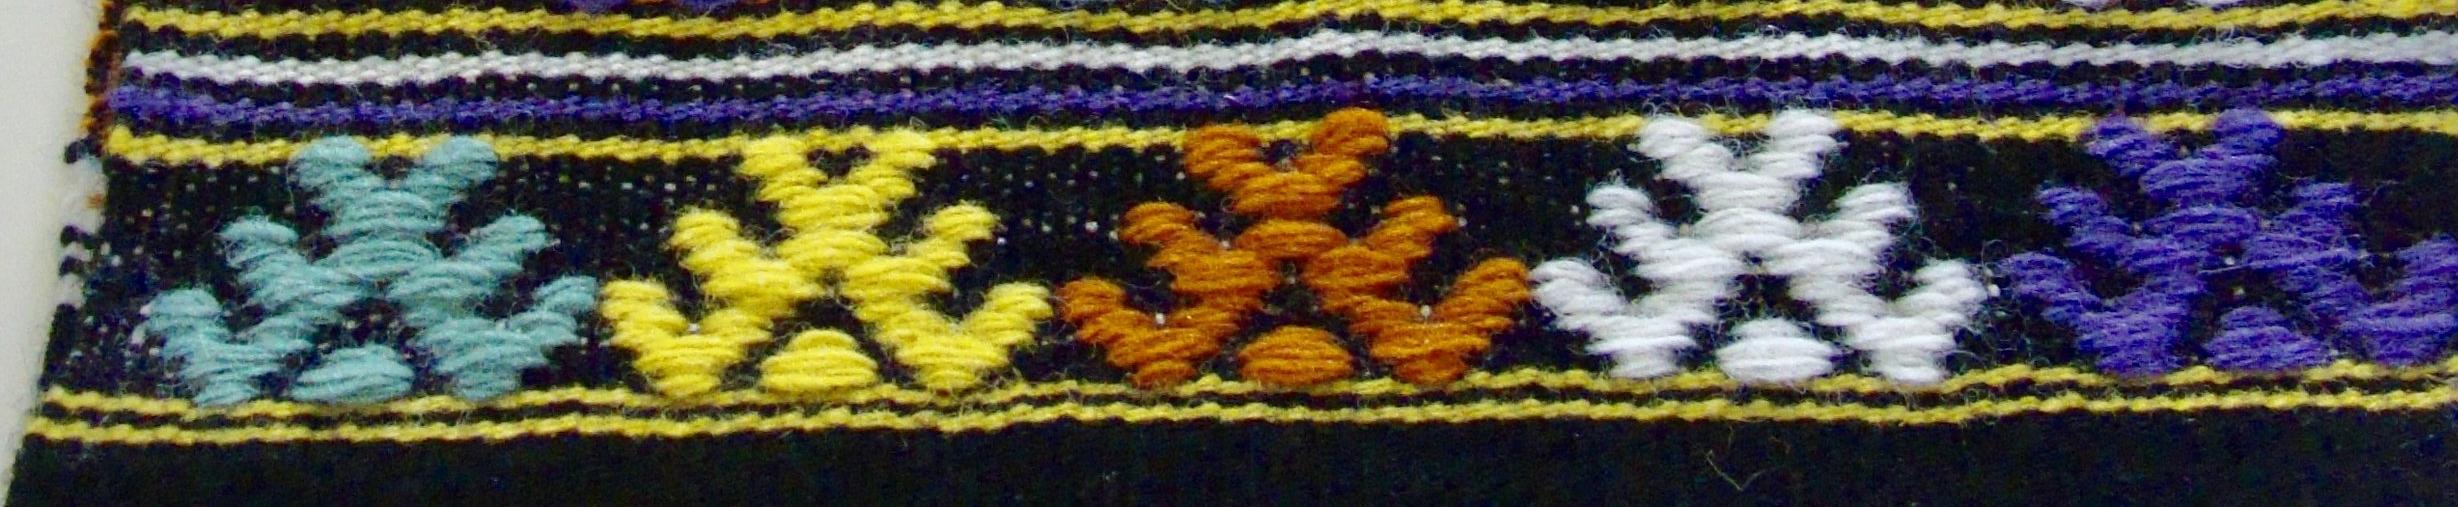 Krabbasnår Swedish Art Weave